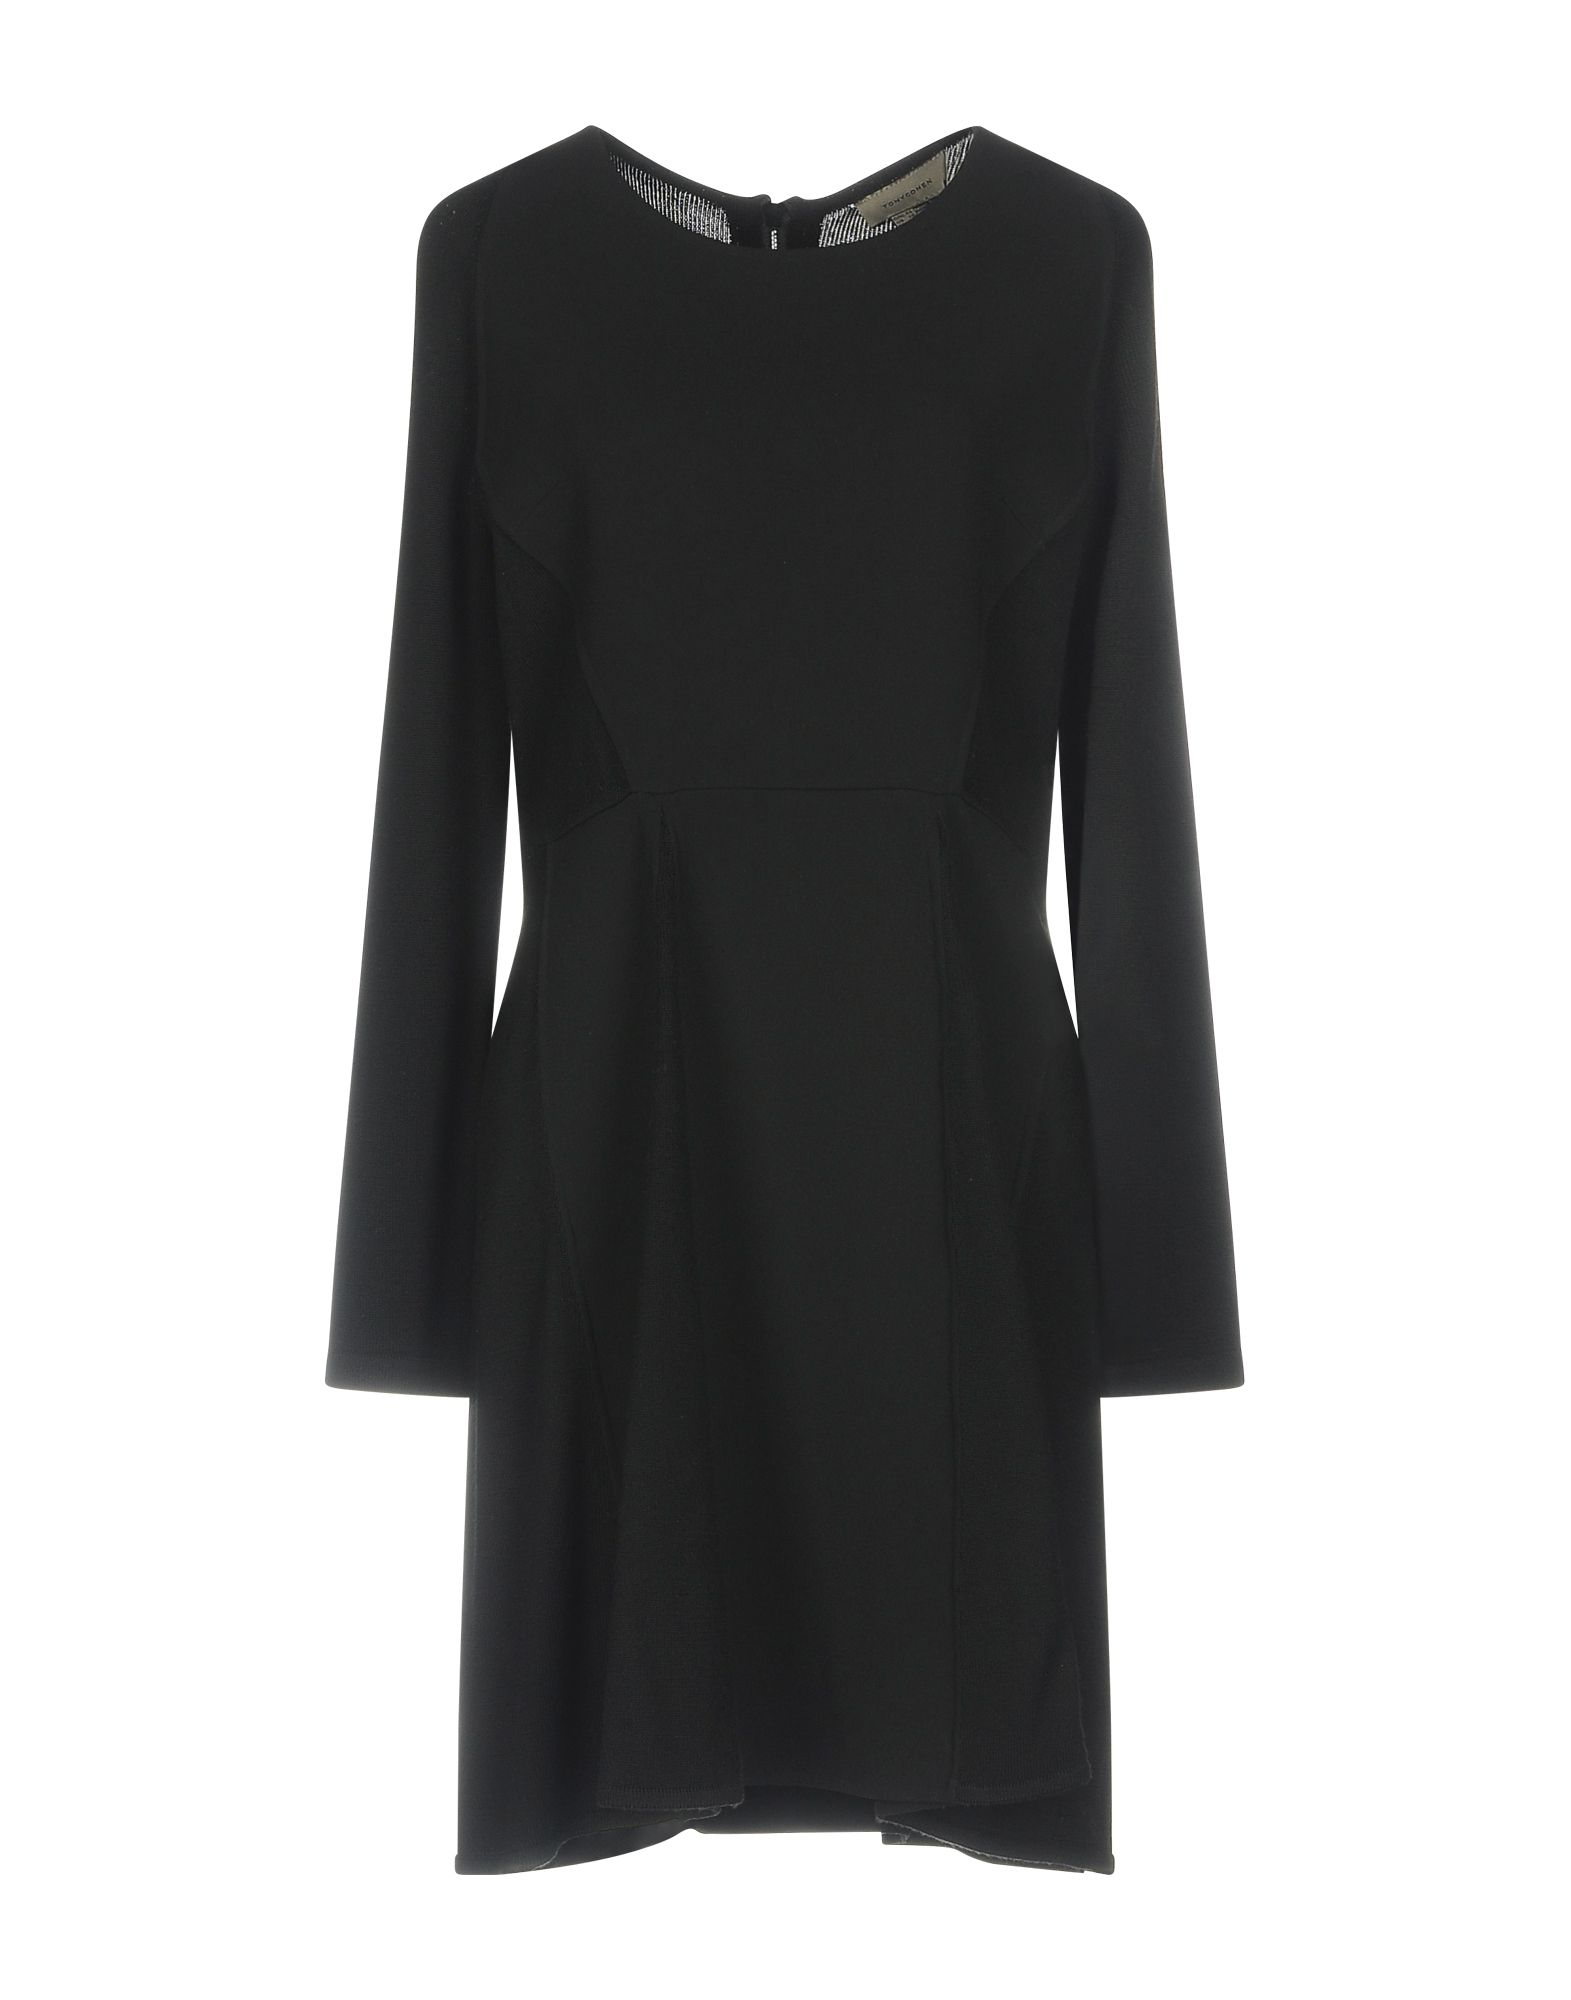 TONY COHEN Short Dress in Black